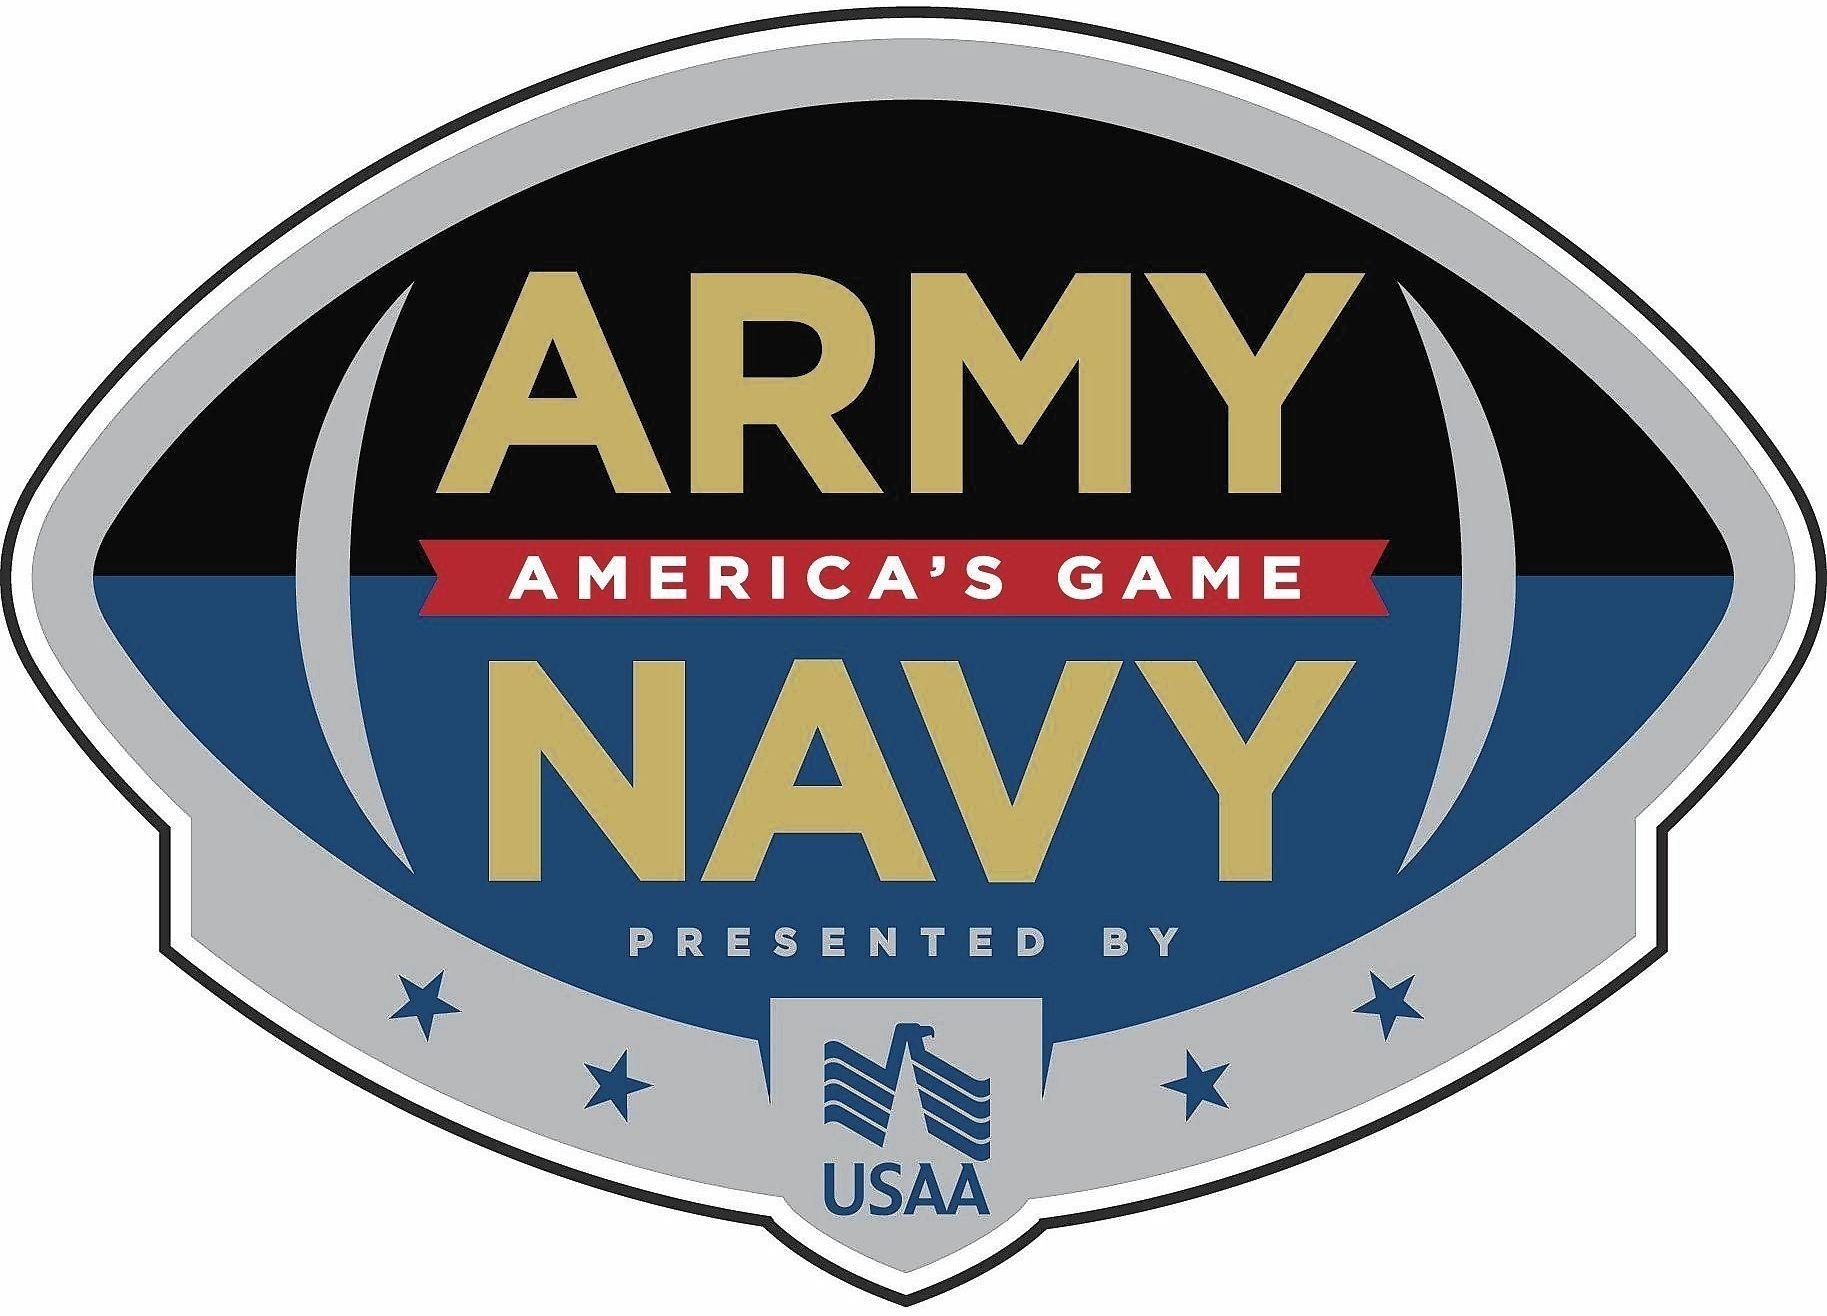 2017 Army-Navy Game liveblog